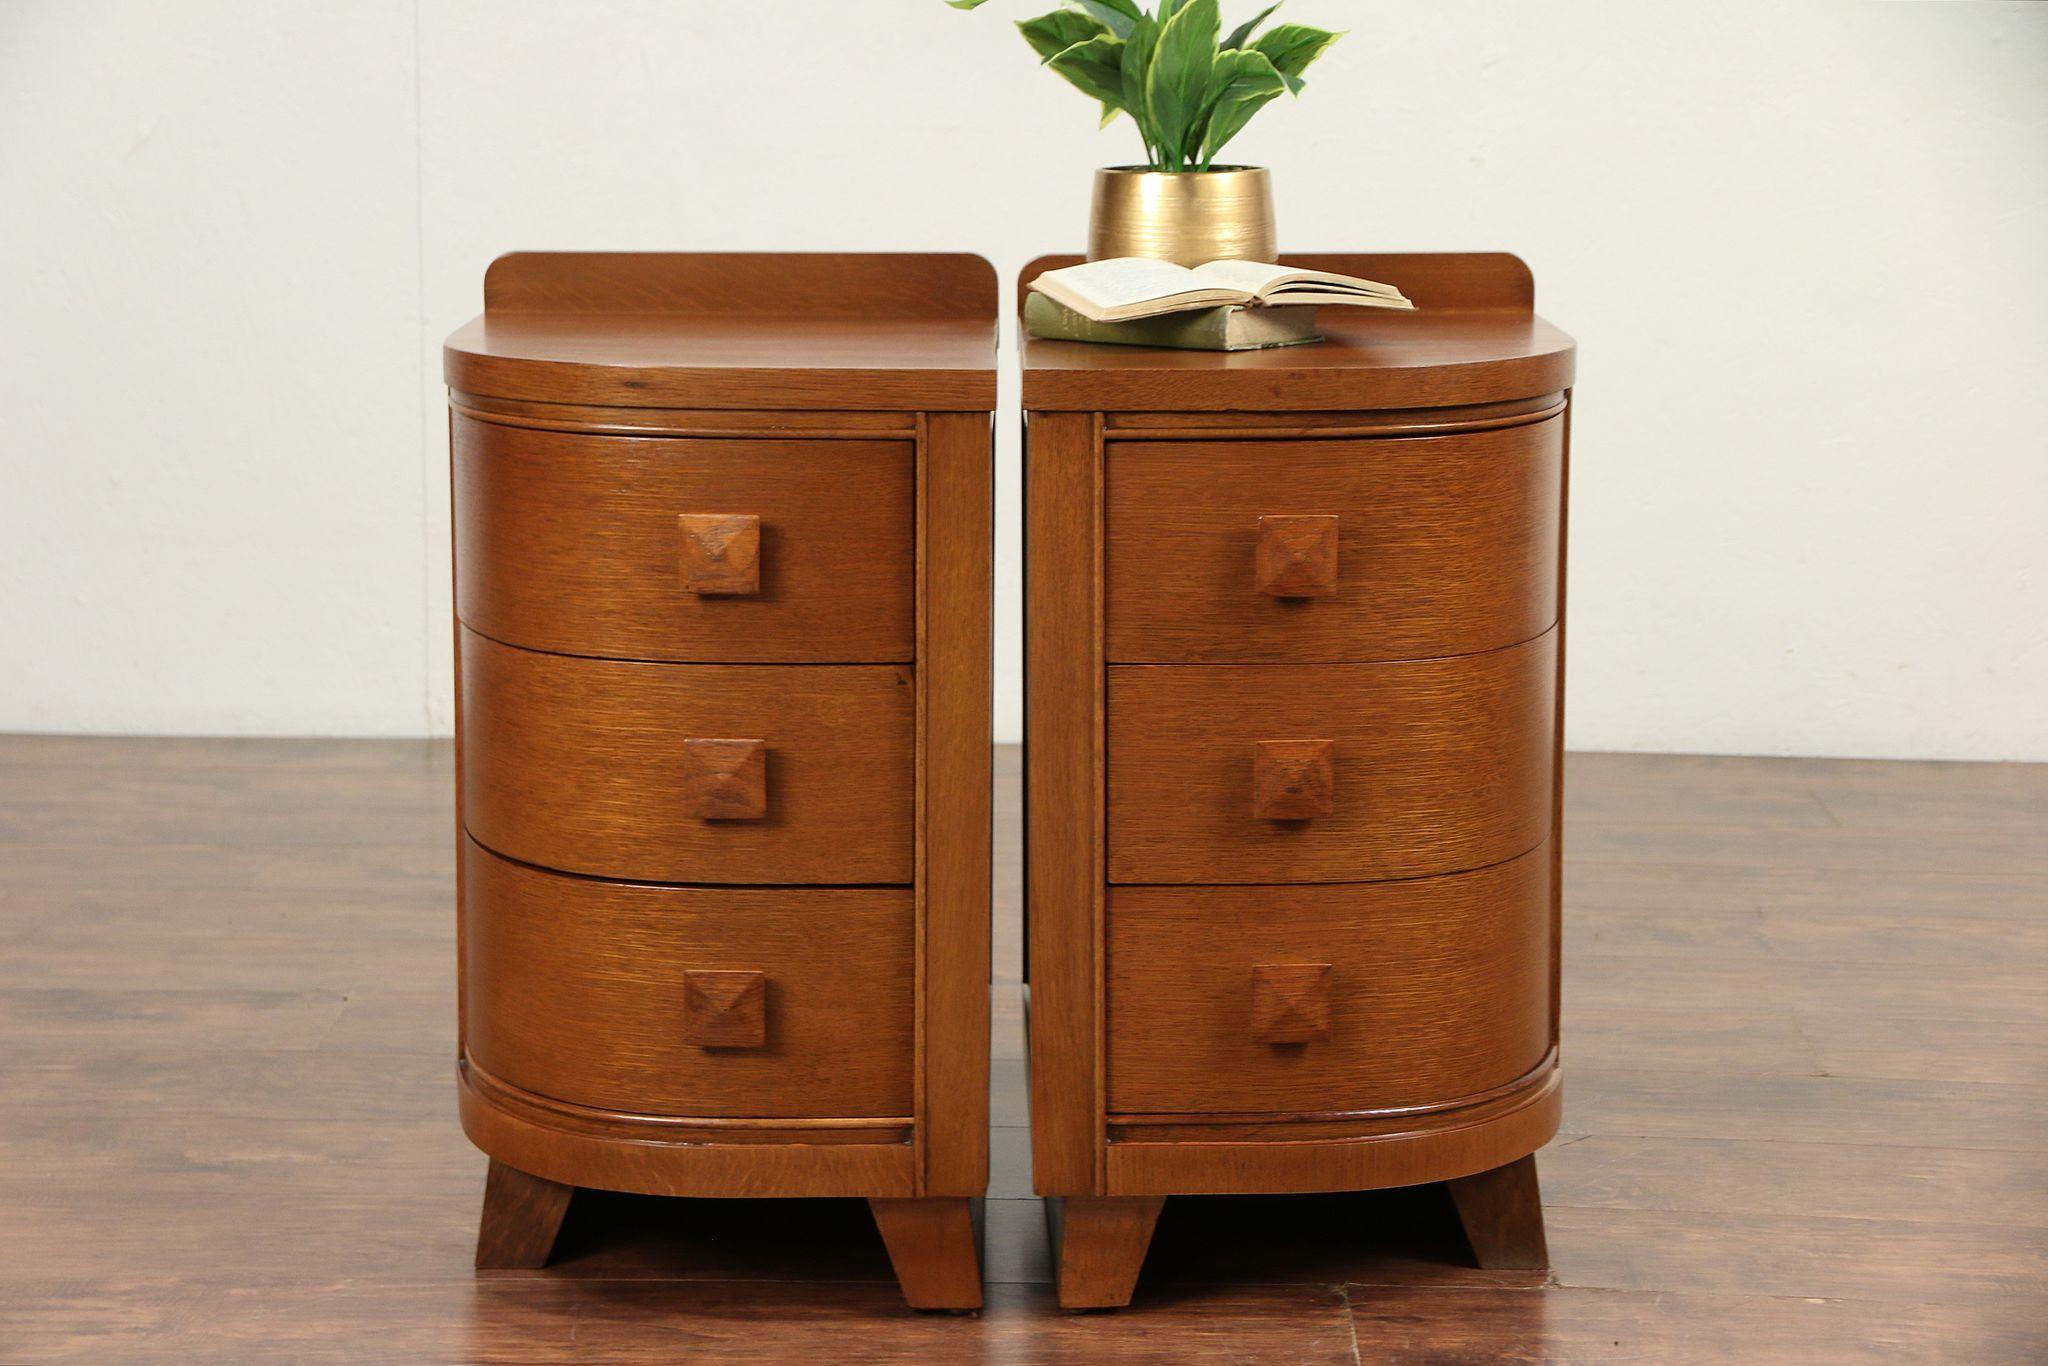 Sold Pair Of Midcentury Modern Oak 1960 Vintage Nightstands Or End Tables 29573 Harp Gallery Antiques Furniture